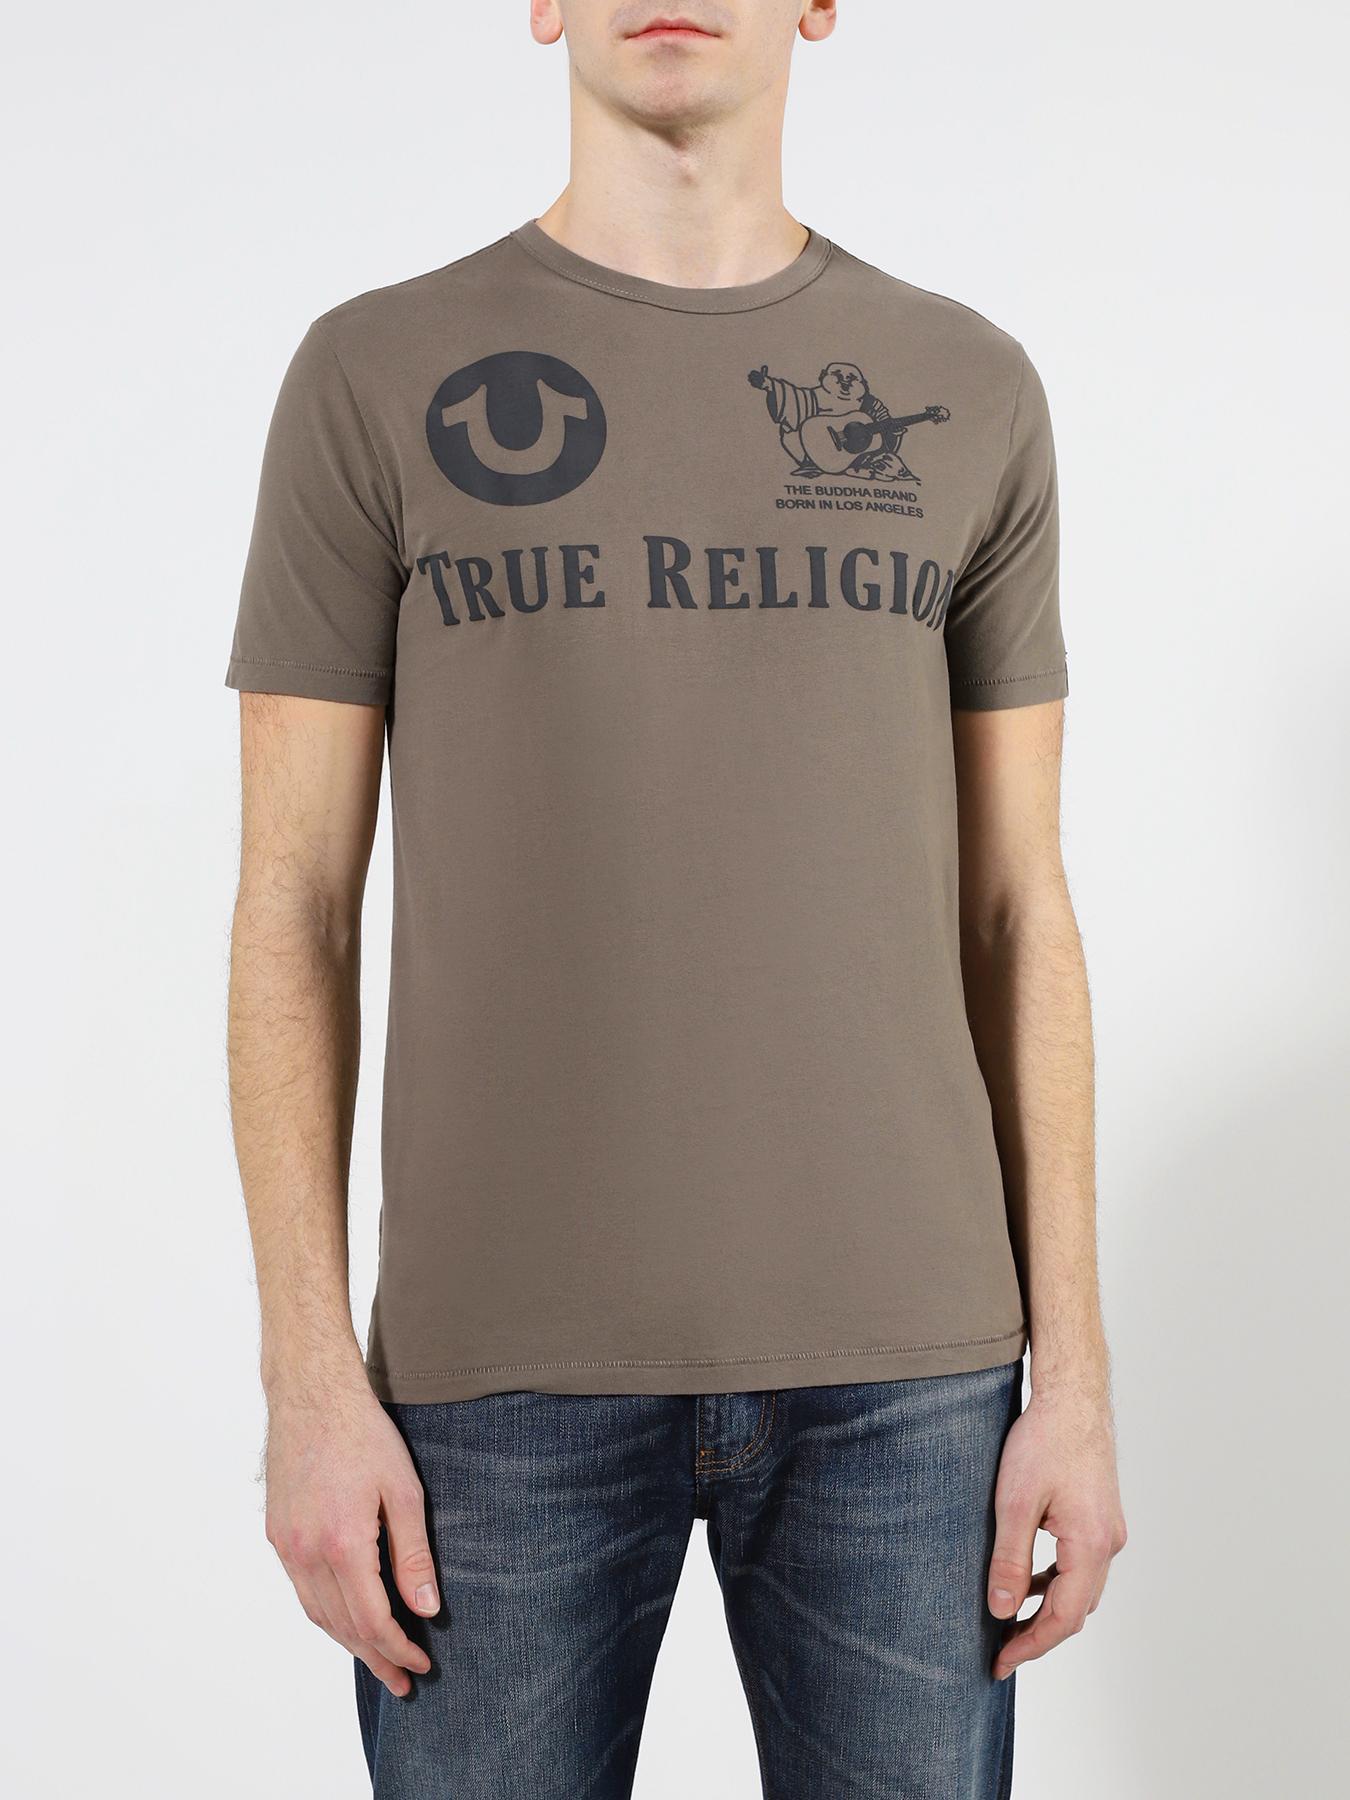 Футболки True Religion Футболка с надписями